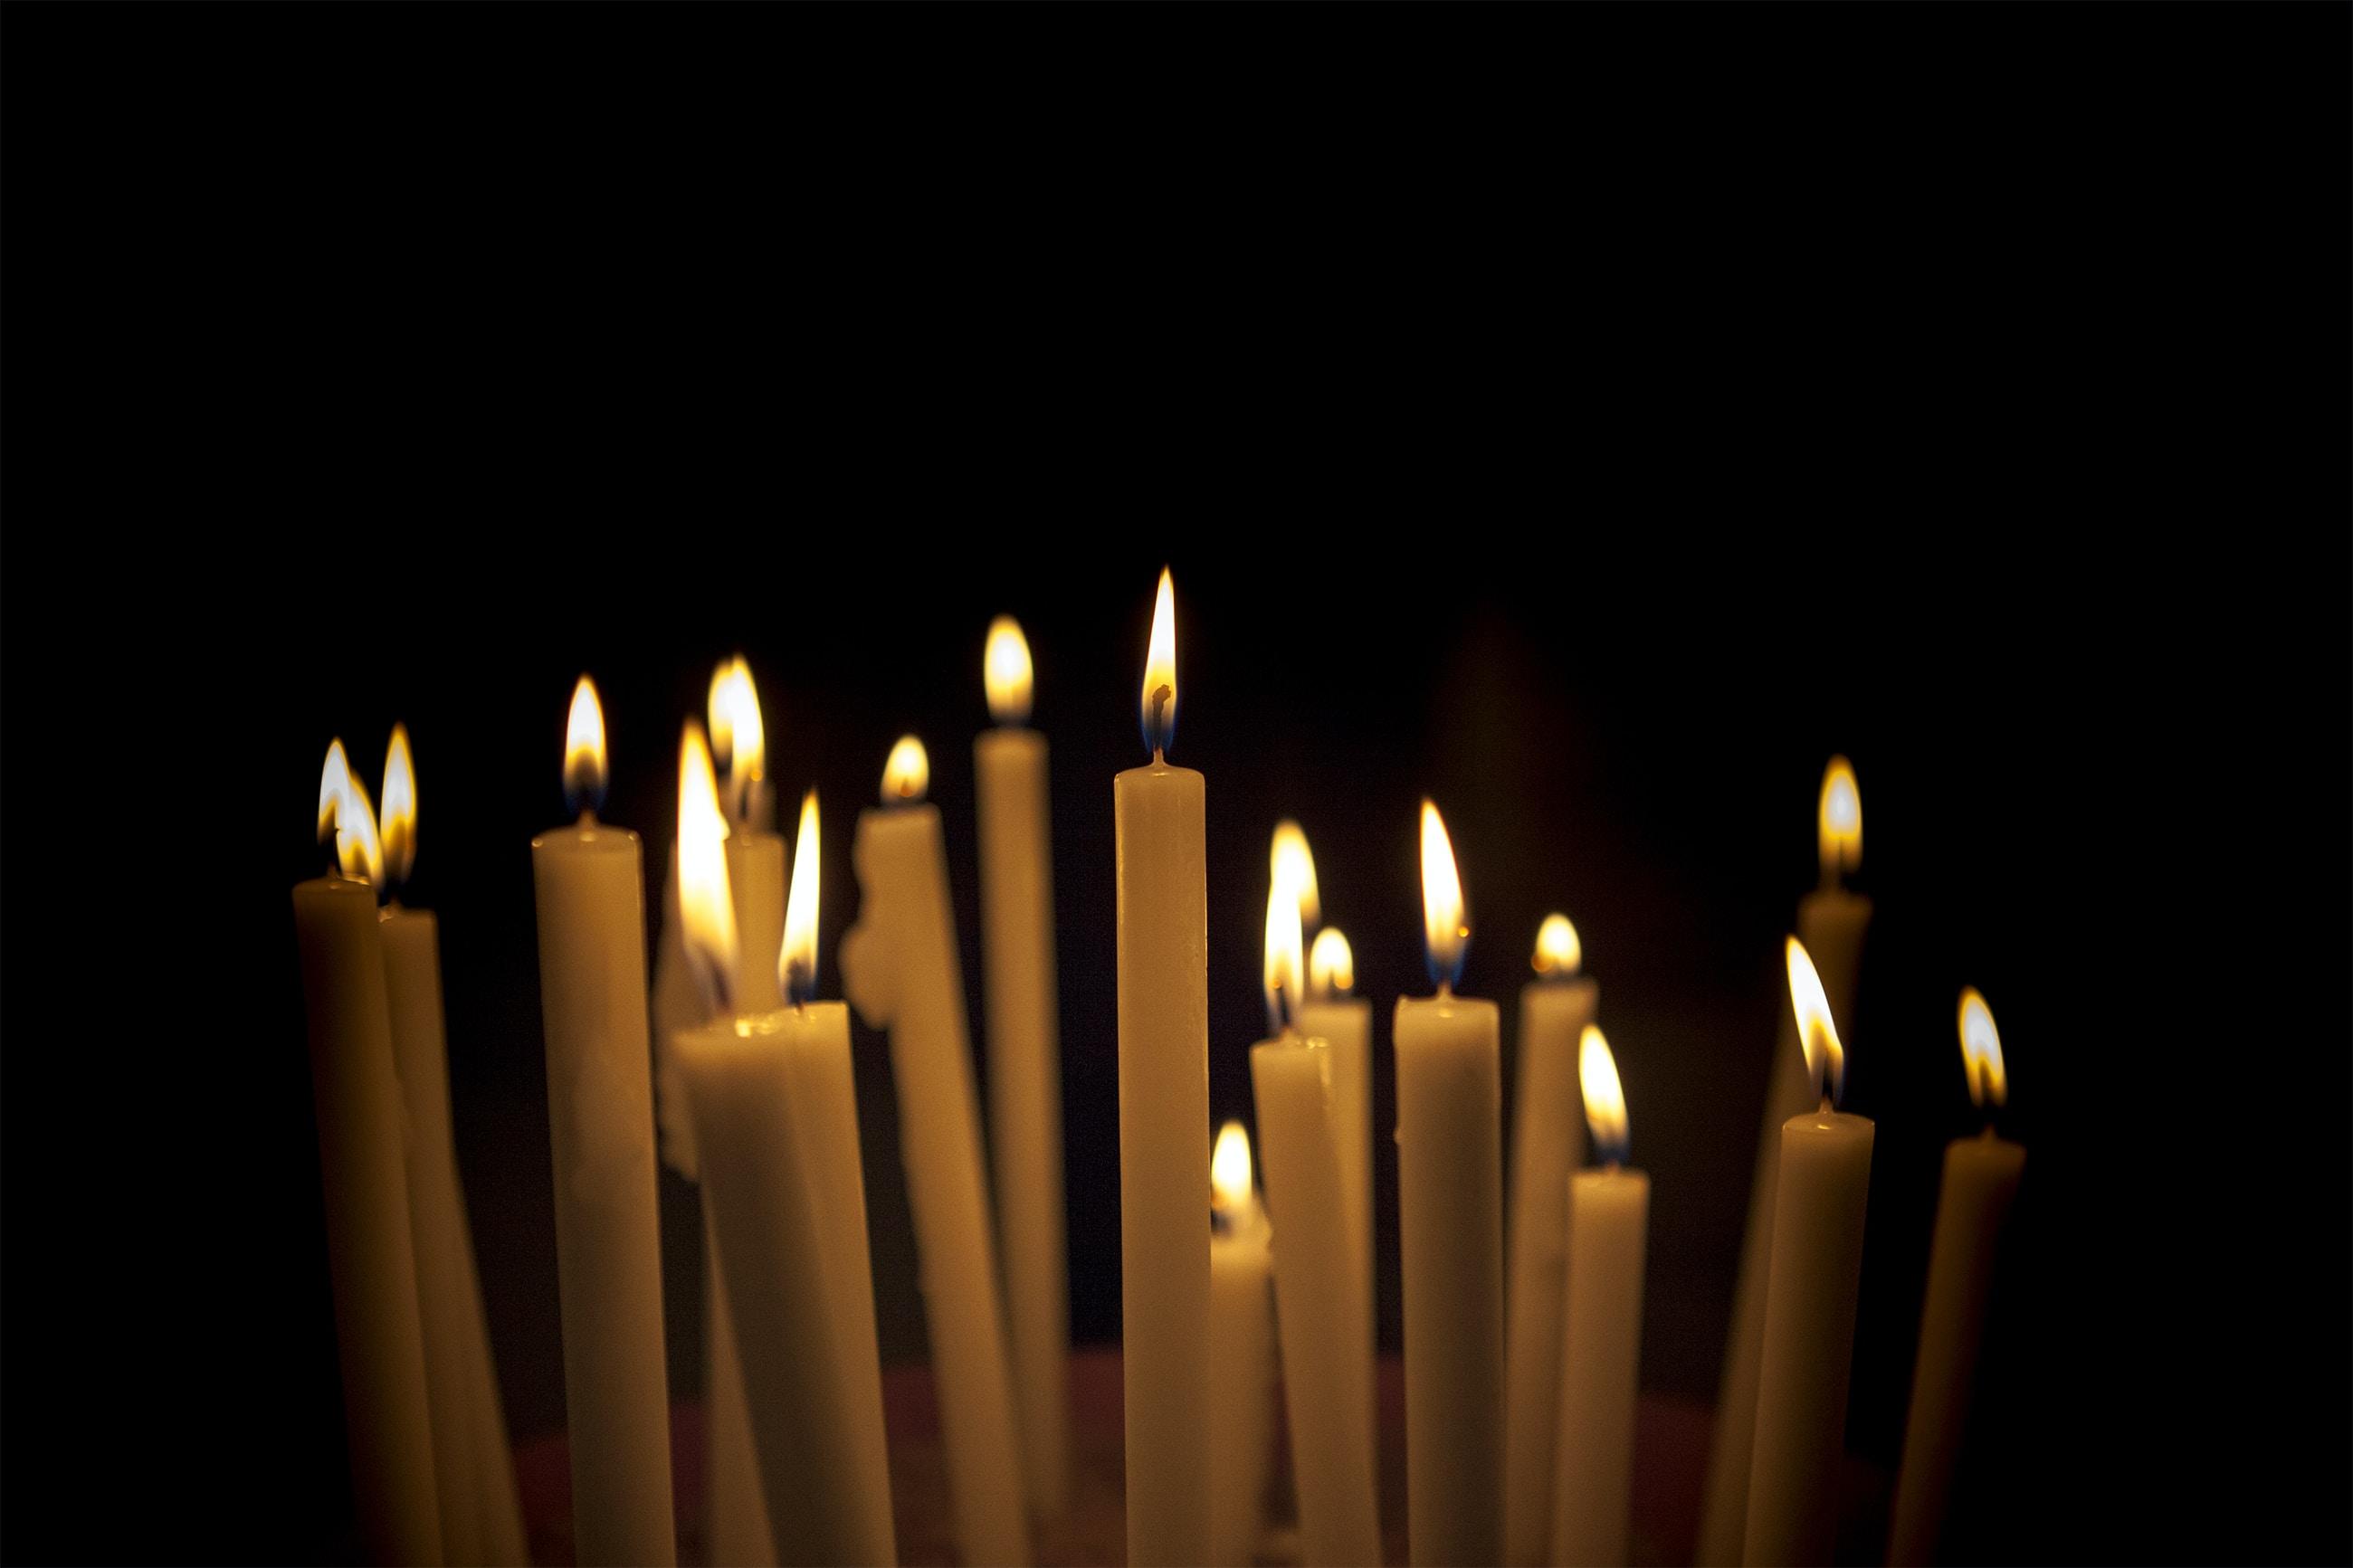 NZ Massacre of followers of Jesus unity stories